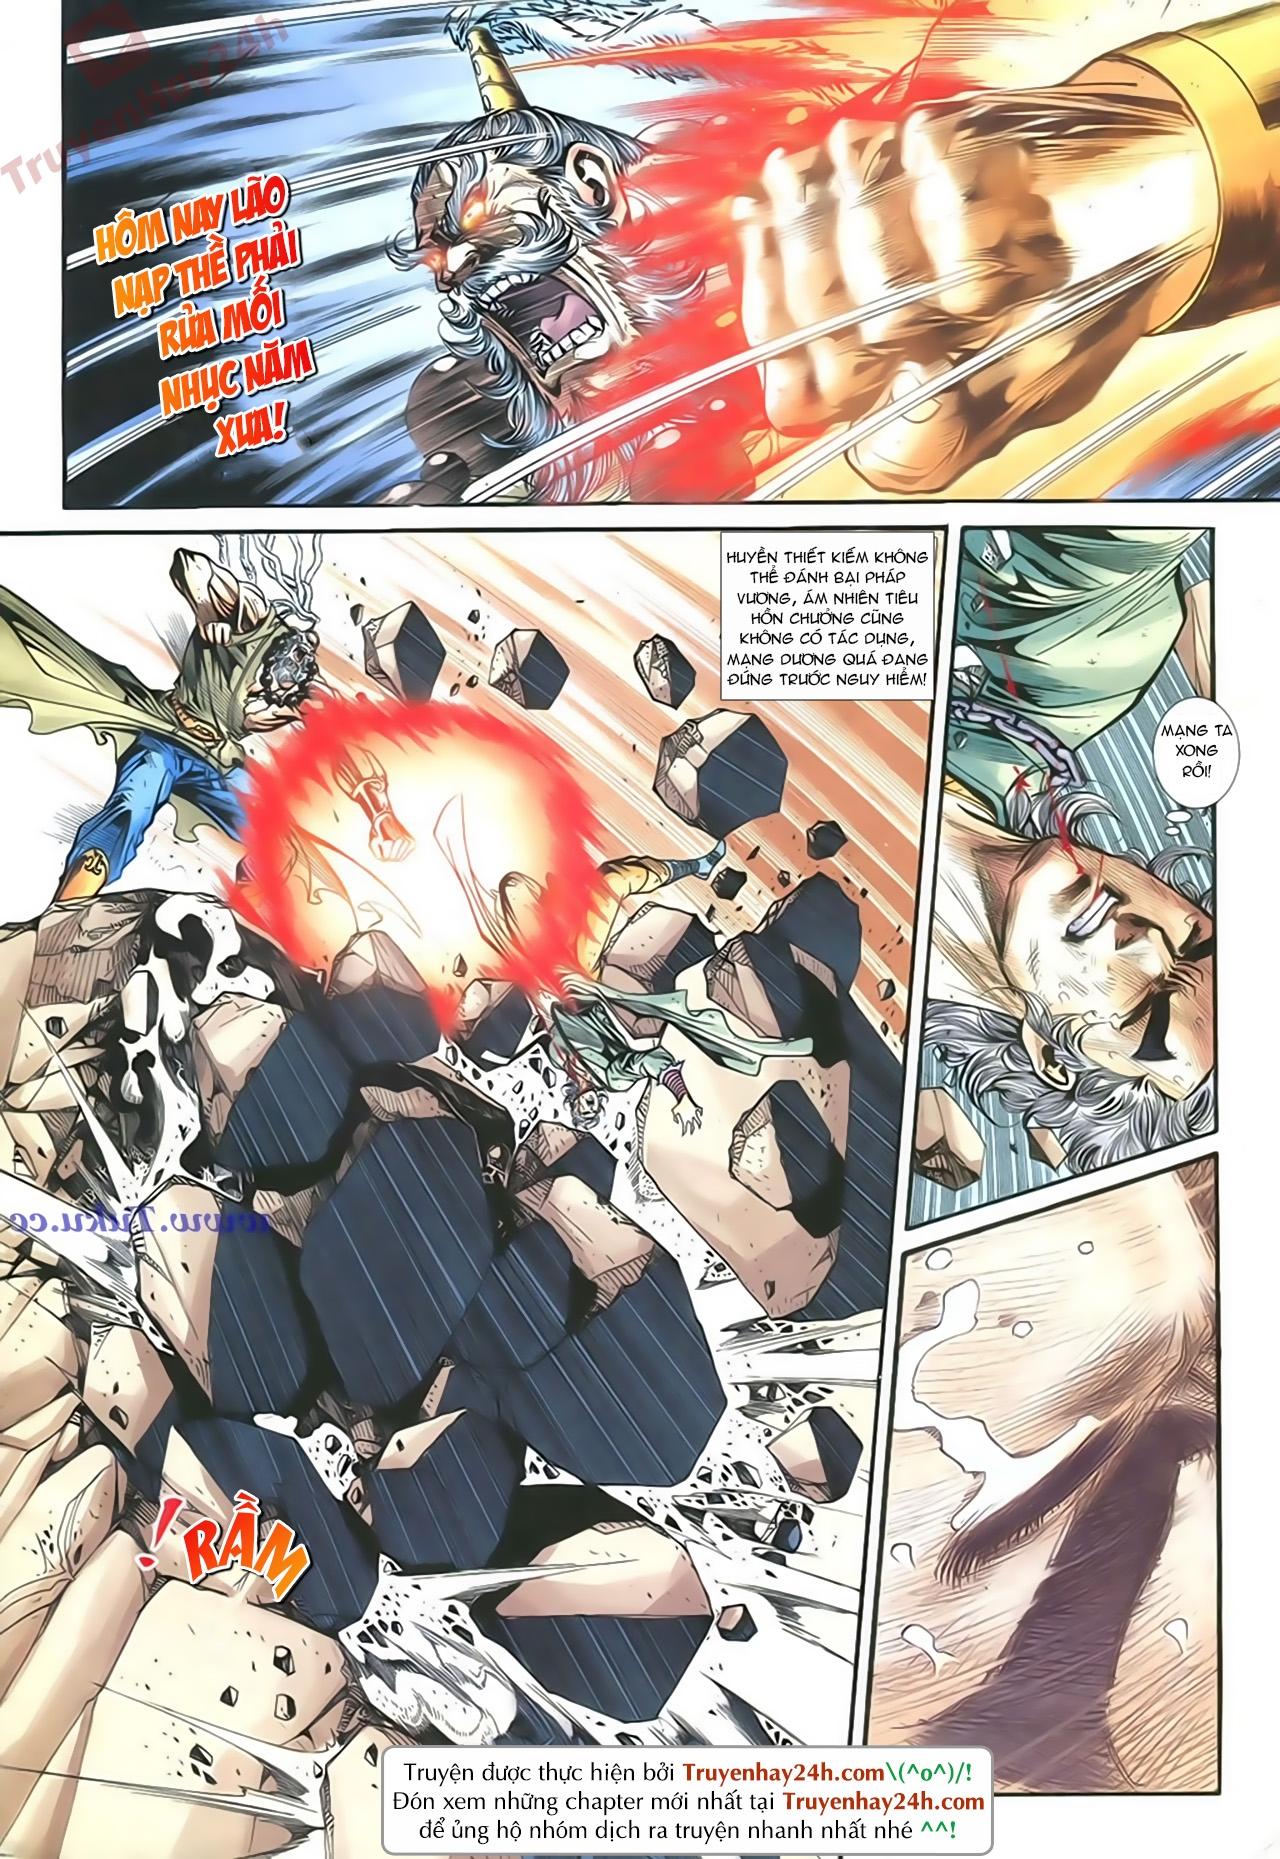 Thần Điêu Hiệp Lữ chap 86 – End Trang 3 - Mangak.info